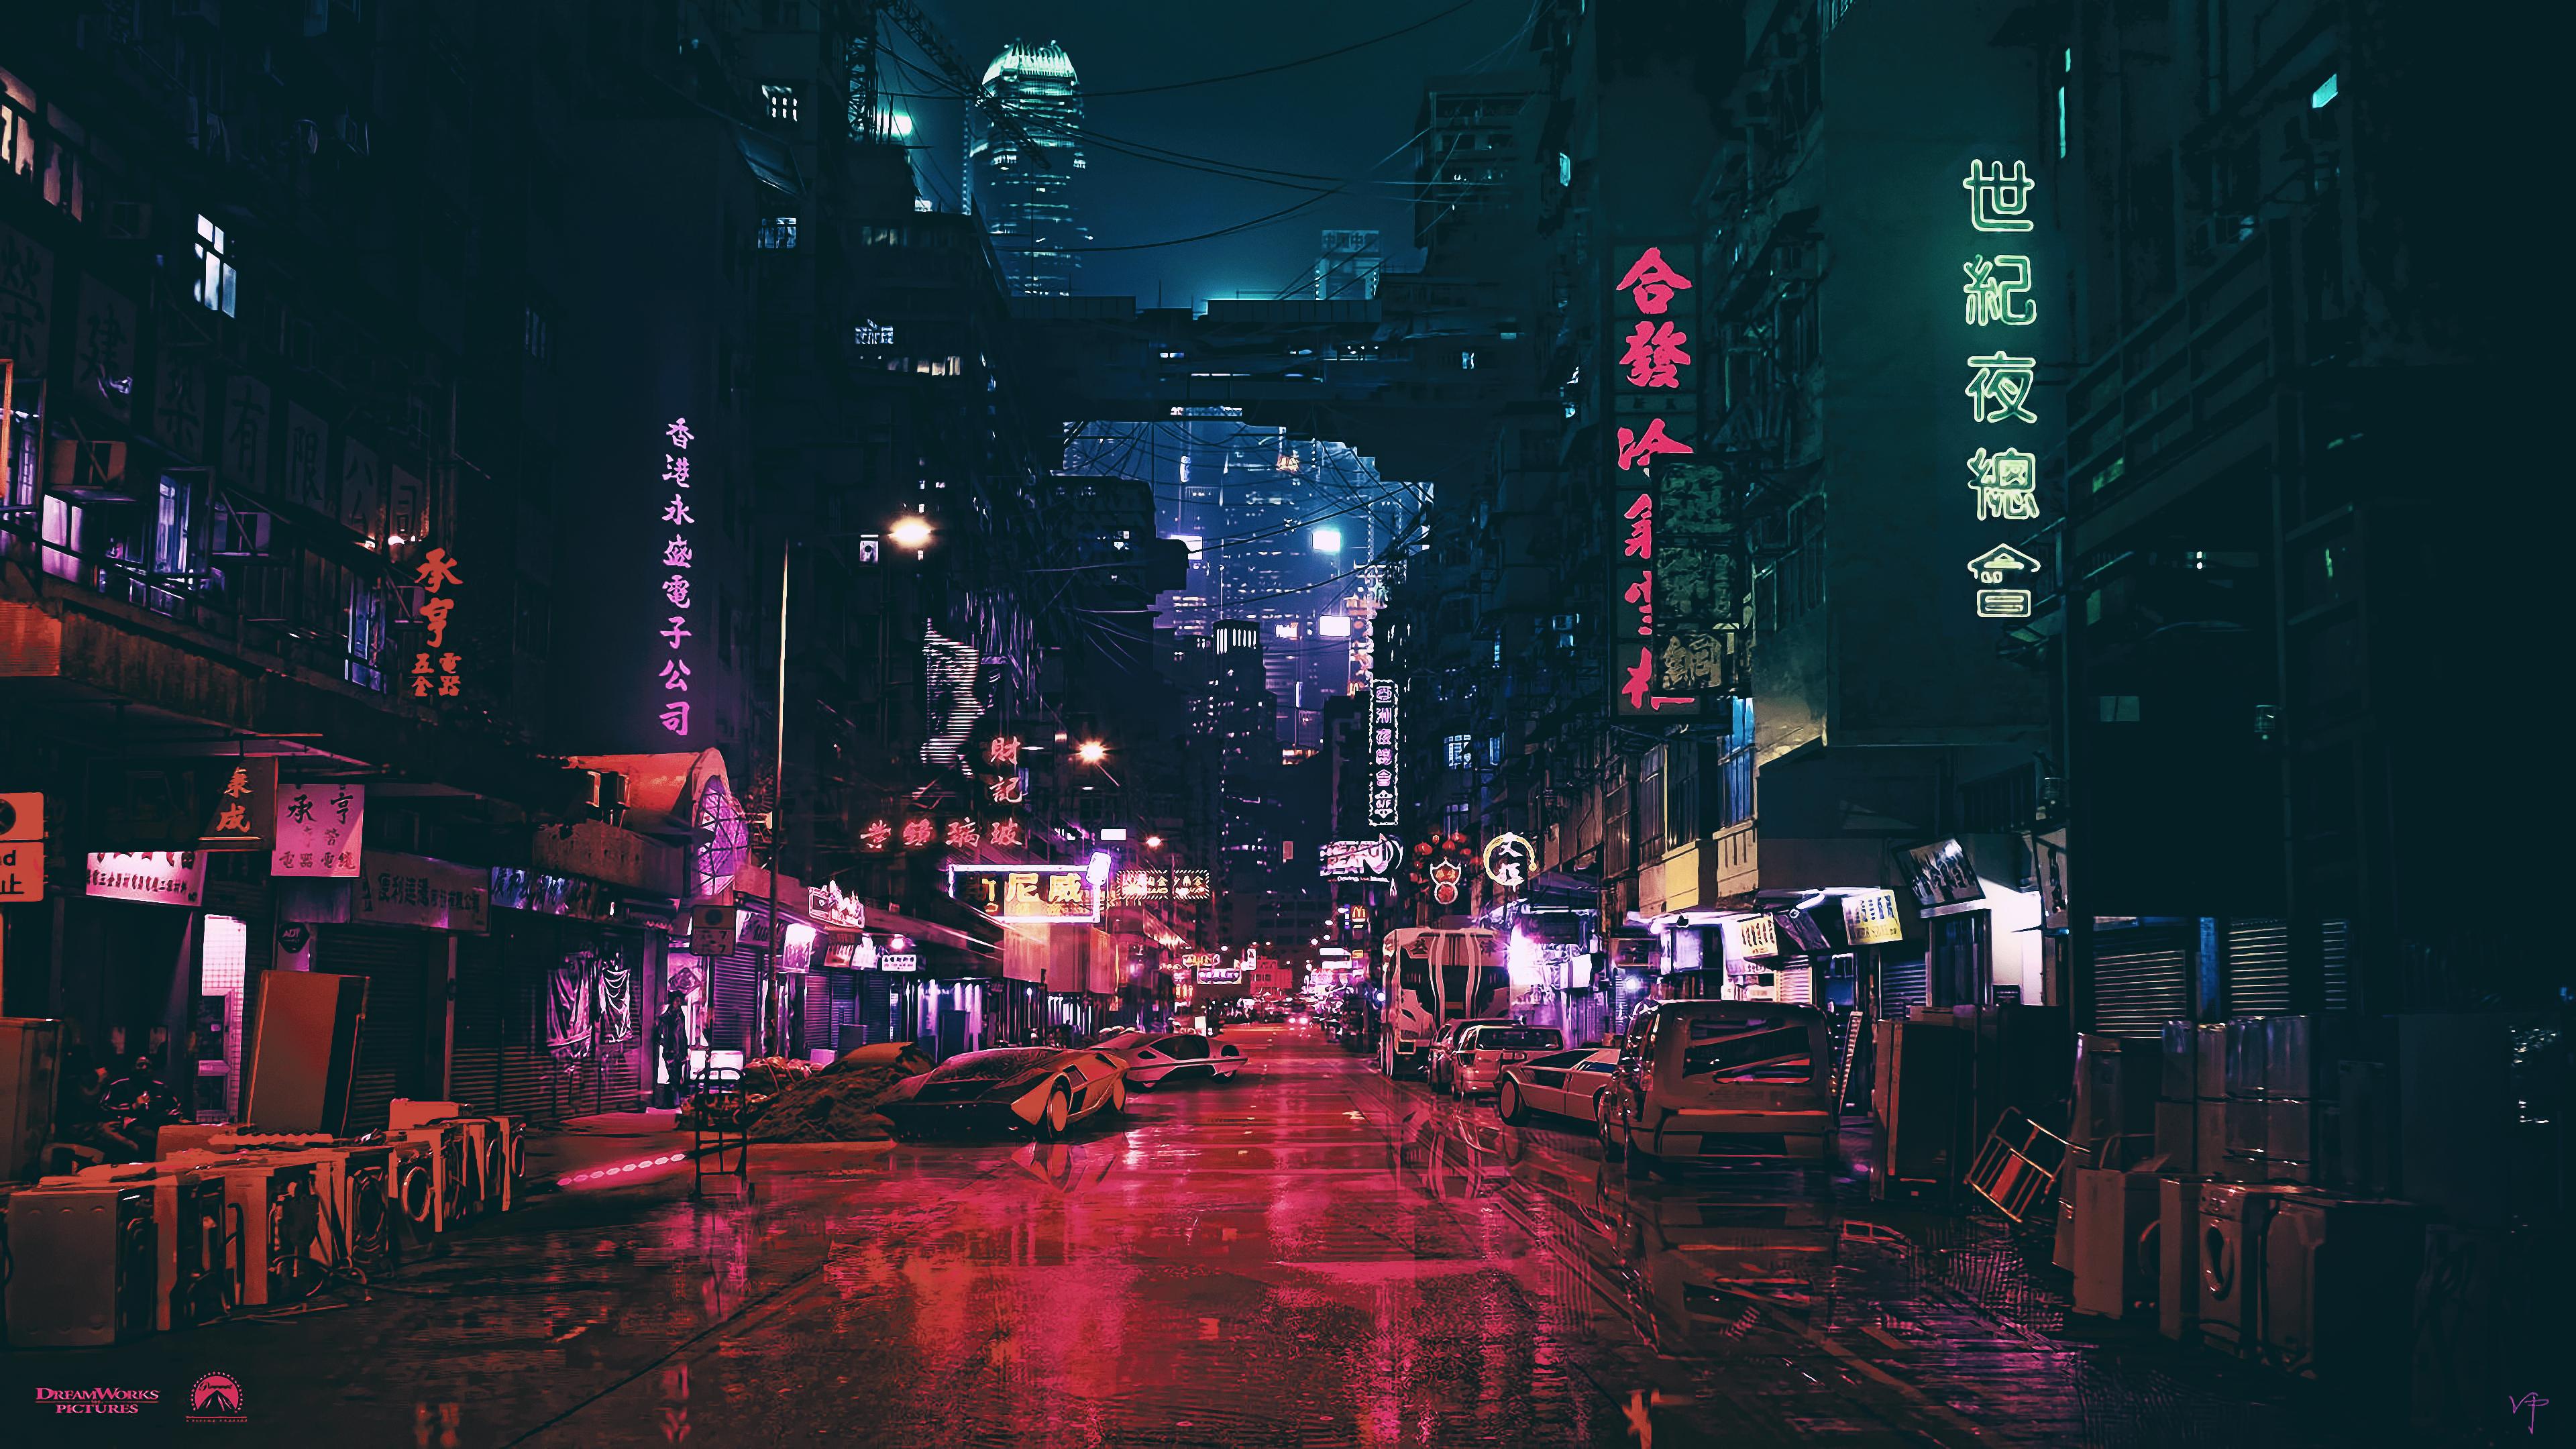 cyberpunk futuristic city science fiction concept art 4k 1540754359 - Cyberpunk Futuristic City Science Fiction Concept Art 4k - scifi wallpapers, hd-wallpapers, digital art wallpapers, cyberpunk wallpapers, artwork wallpapers, artistic wallpapers, 4k-wallpapers